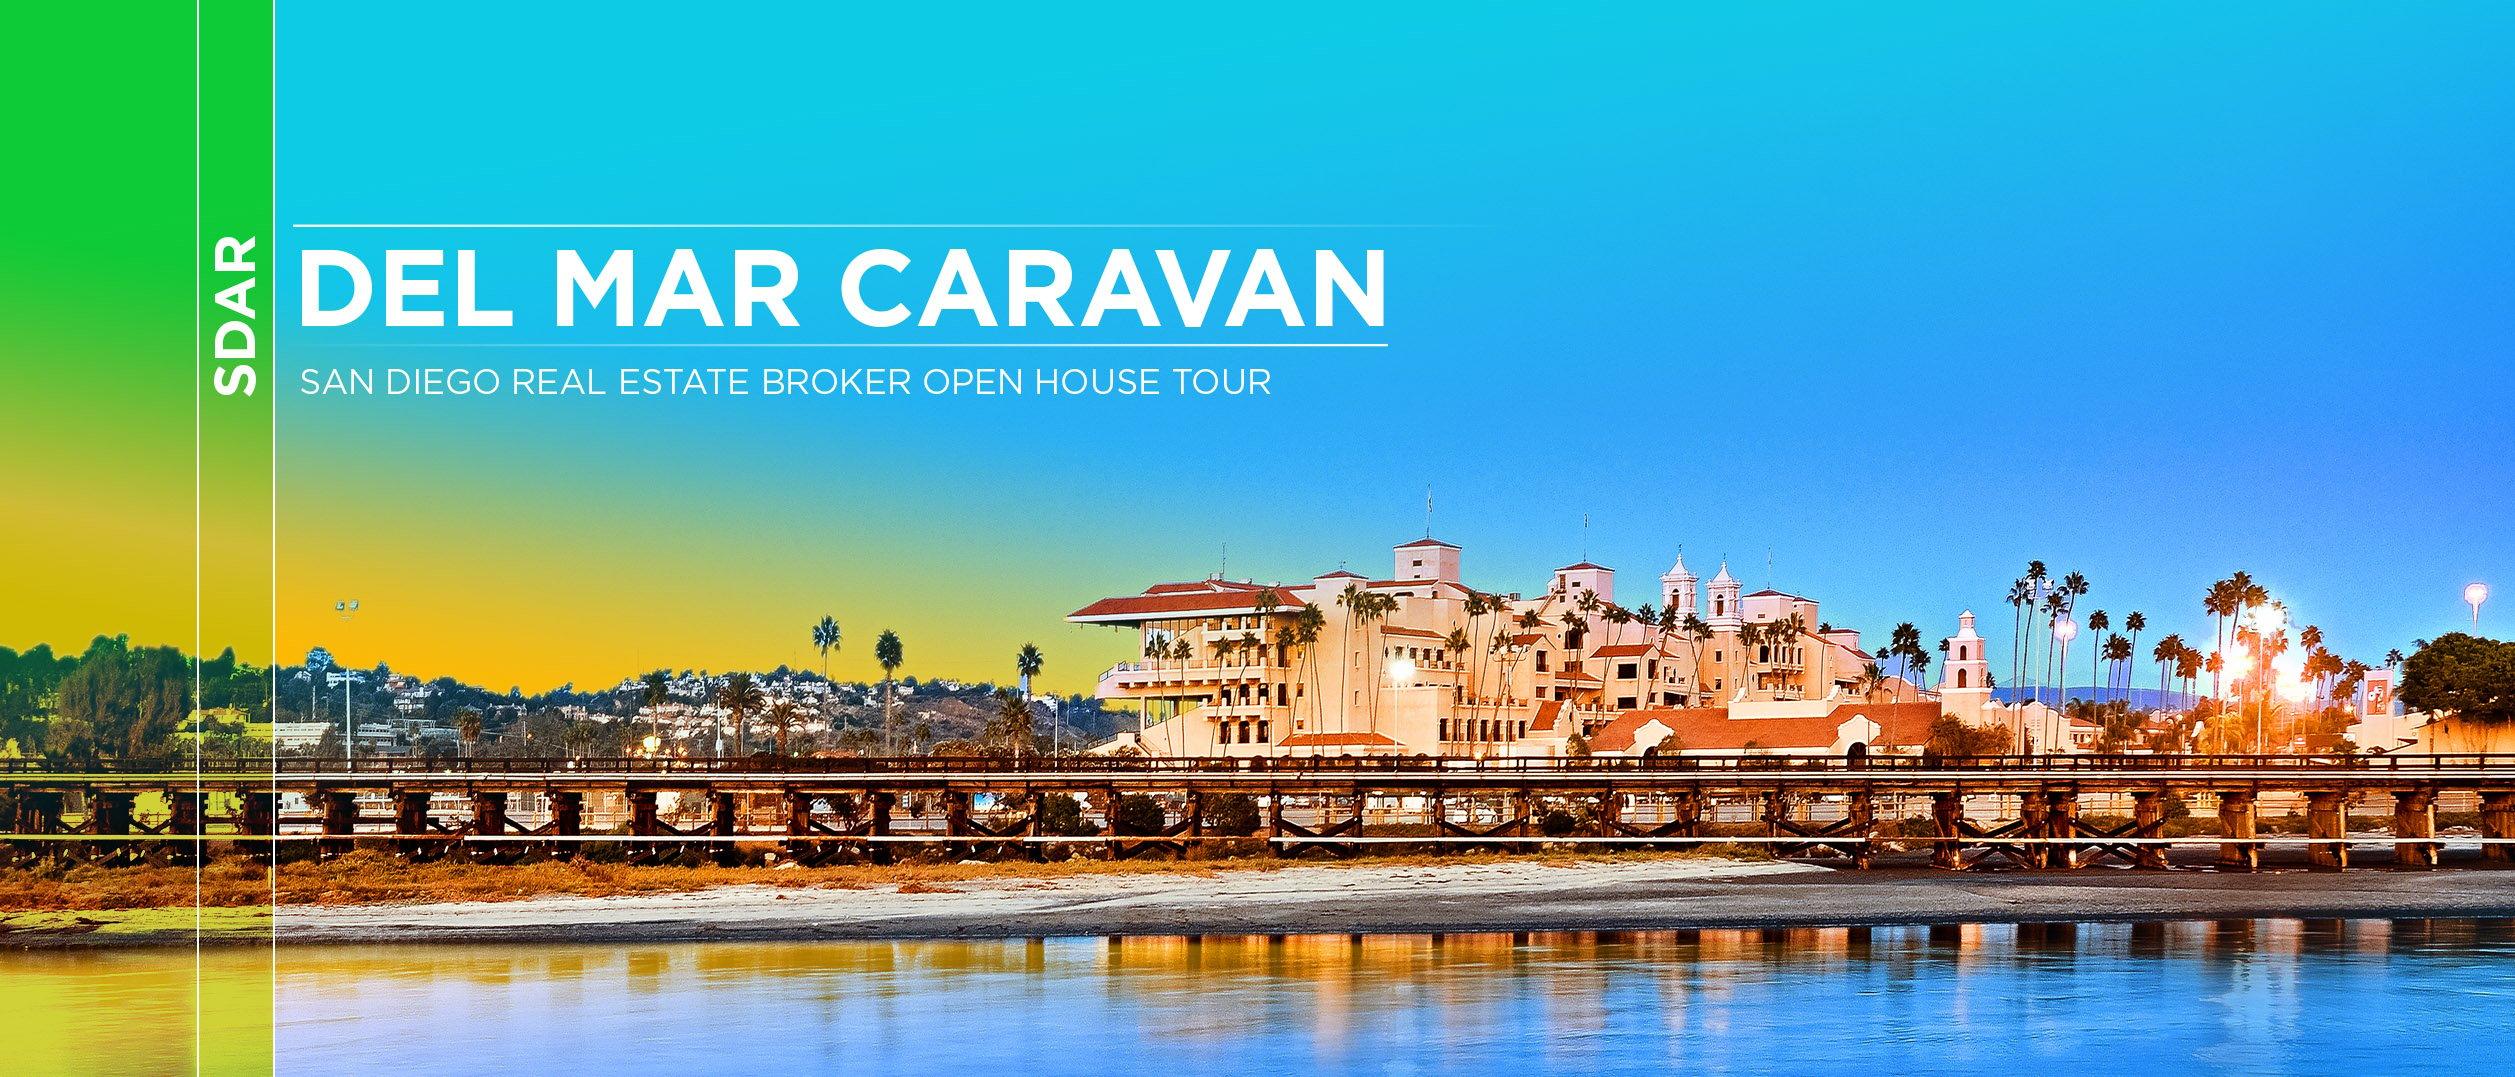 del_mar_caravan_header2.jpg